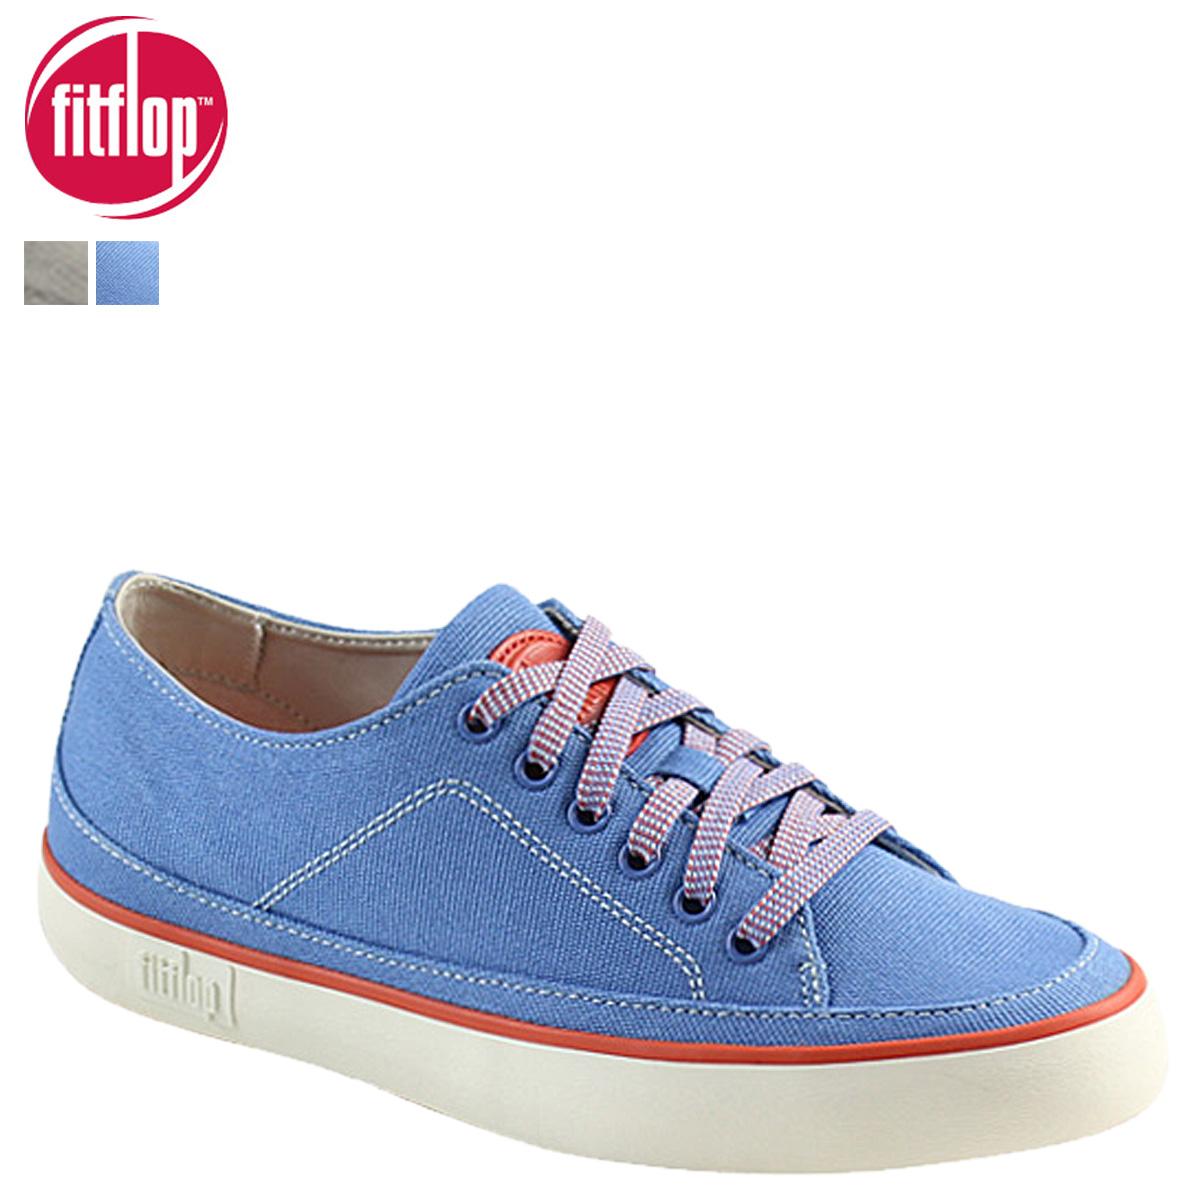 2b61e76d535 Sugar Online Shop  Fit flops FitFlop sneakers 184-068 184-226 SUPER ...